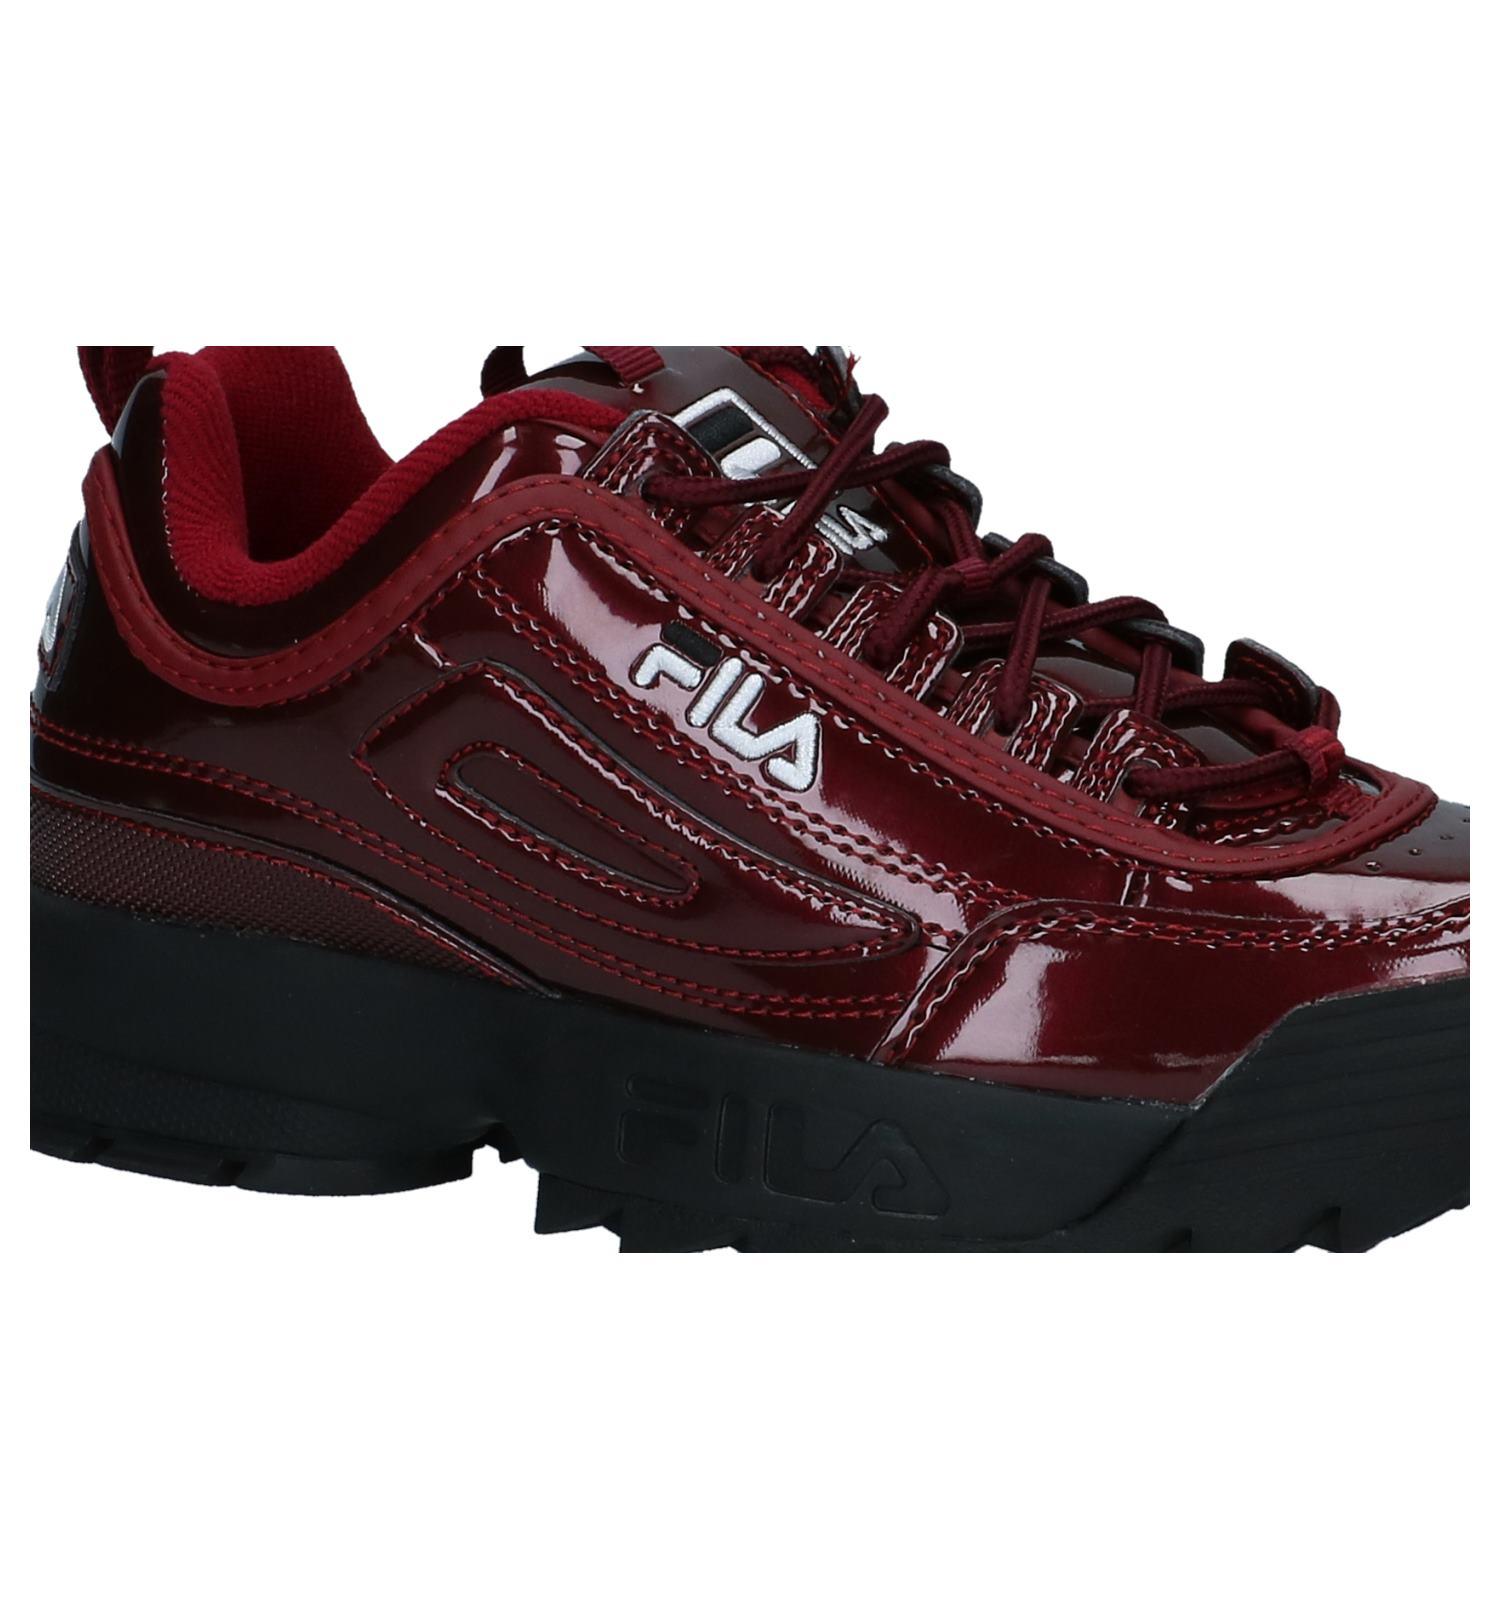 0e8997e2748 Bordeaux Sneakers Fila Disruptor   TORFS.BE   Gratis verzend en retour